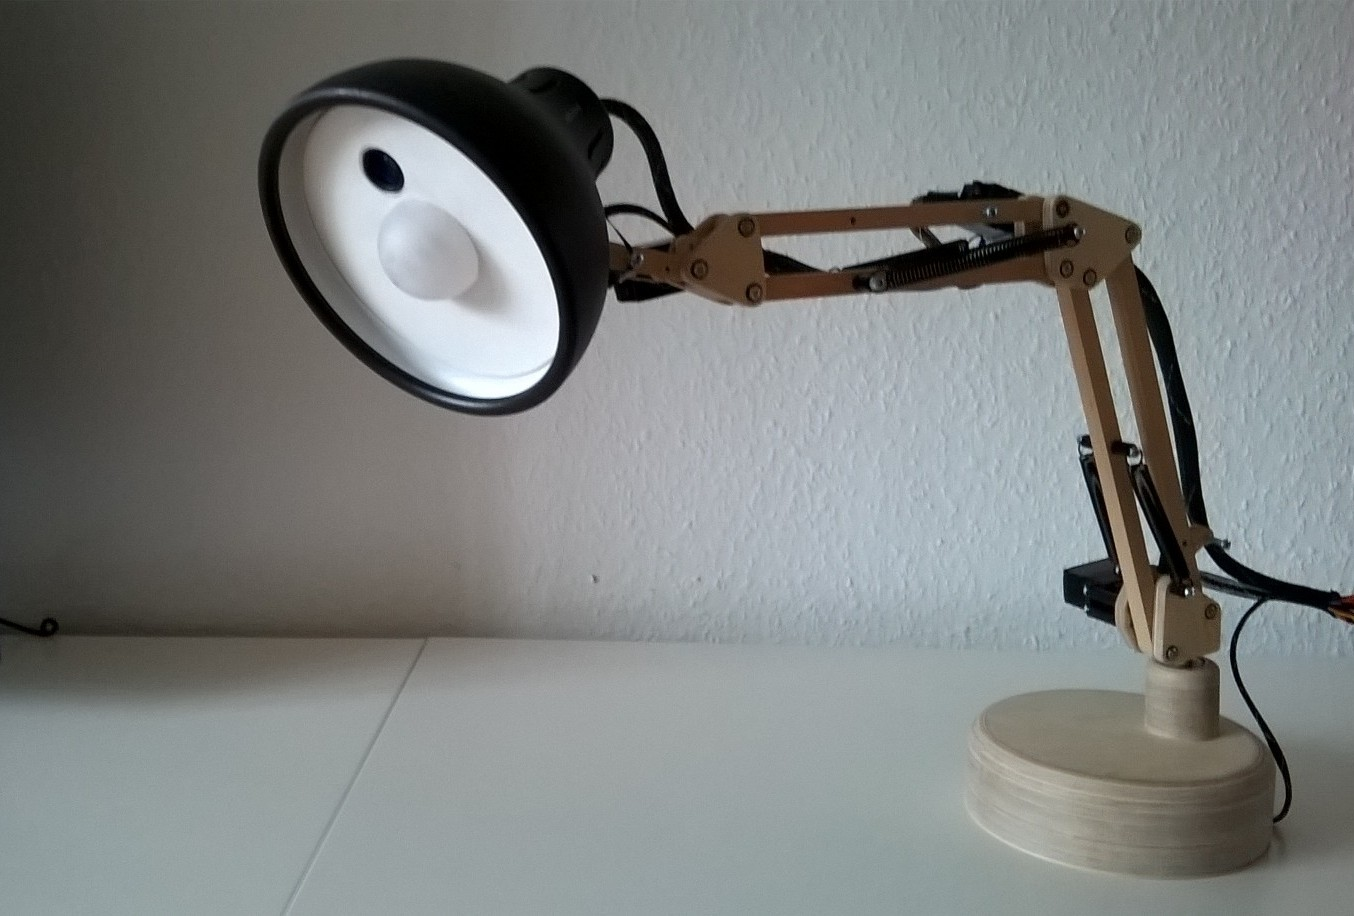 Adorable Robotic Pixar Lamp Recognizes Your Face Make